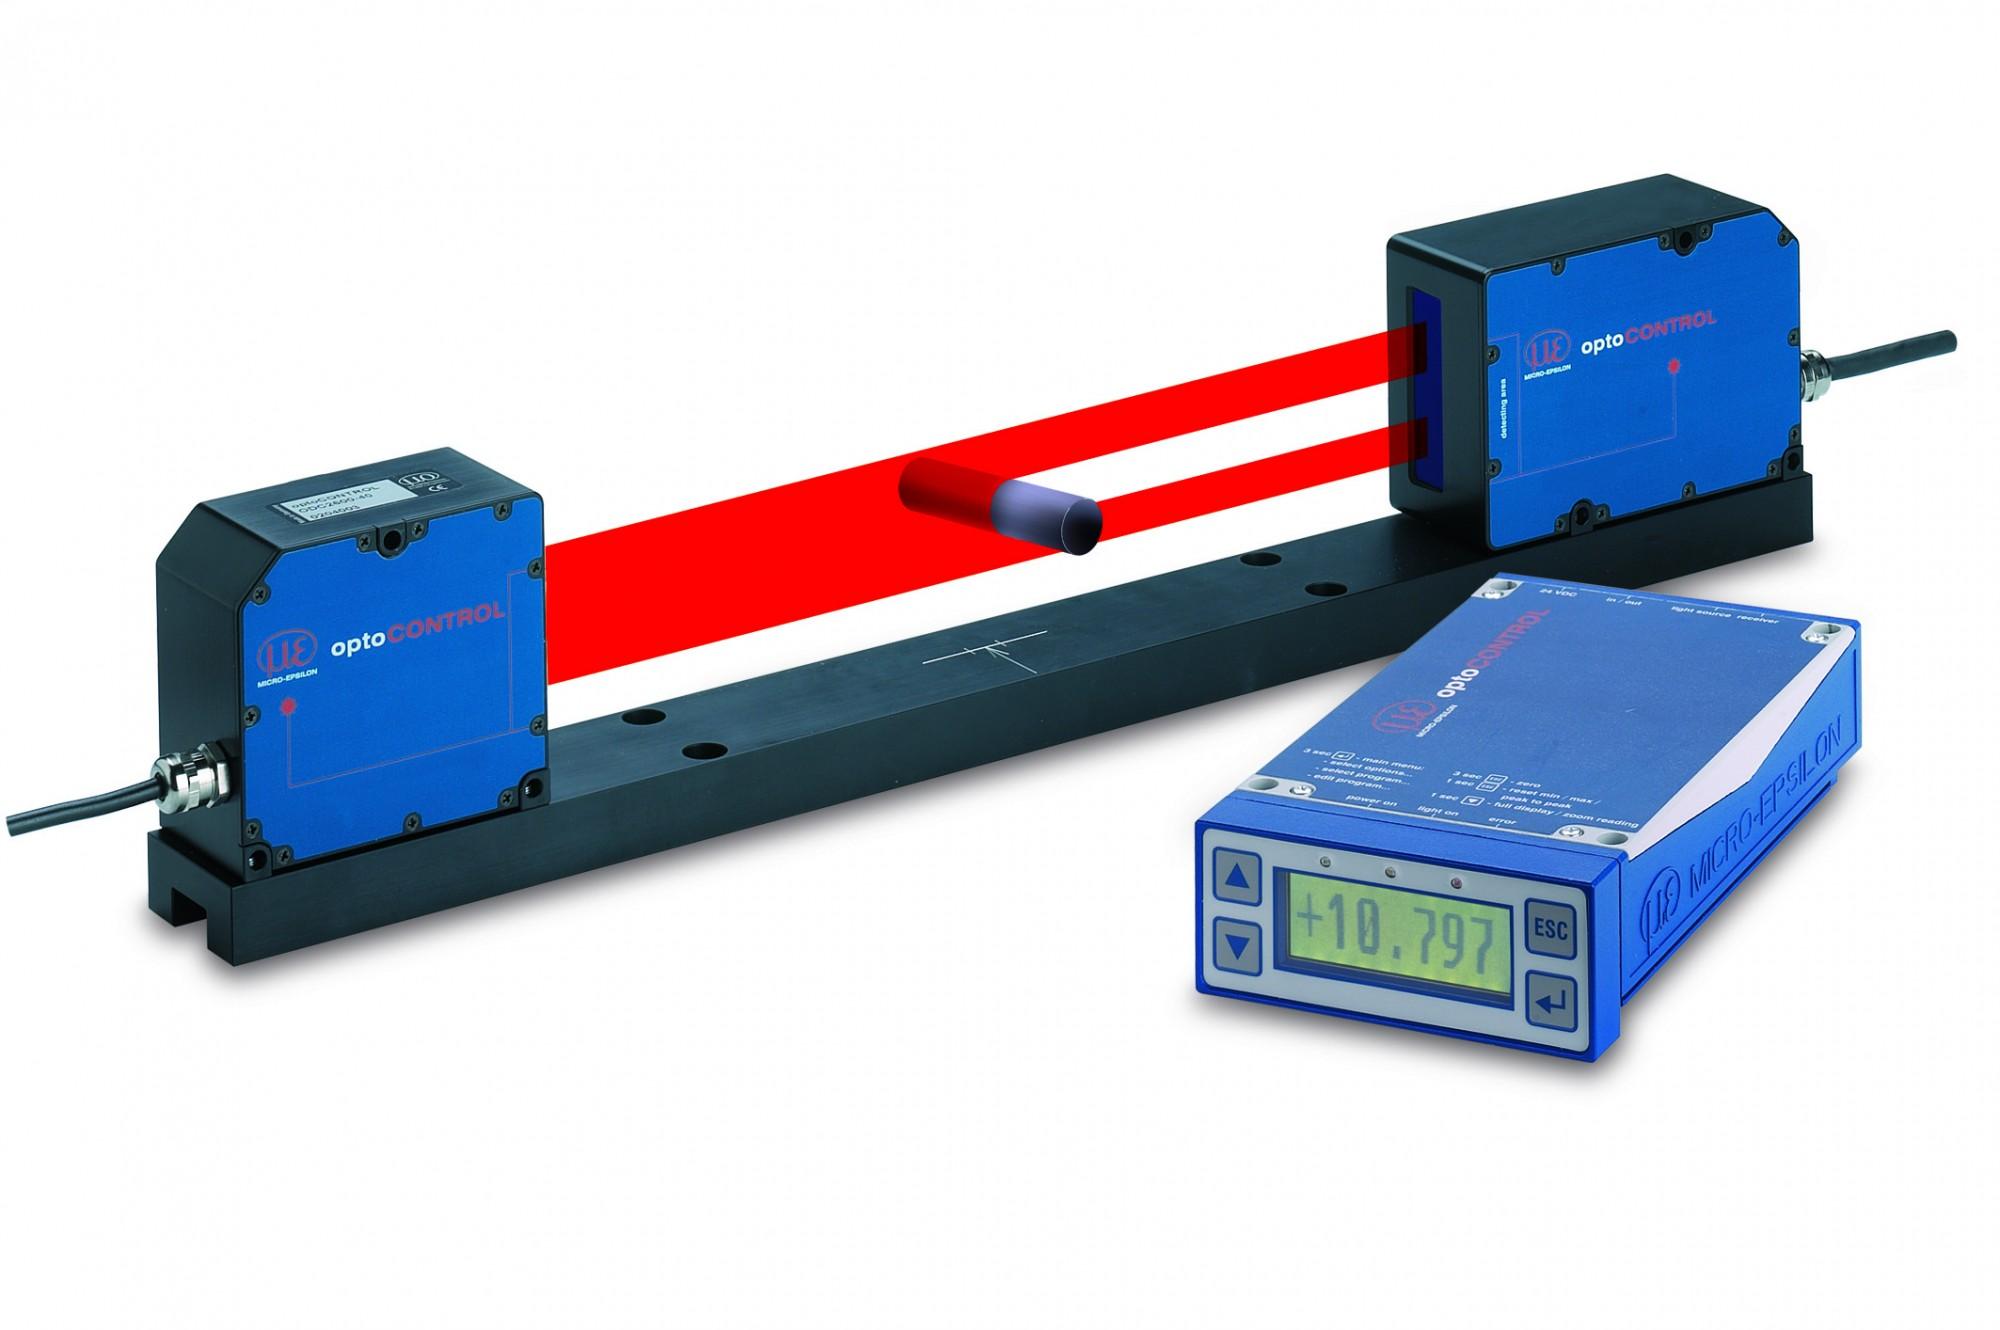 mikrometr laserowy optoCONTROL